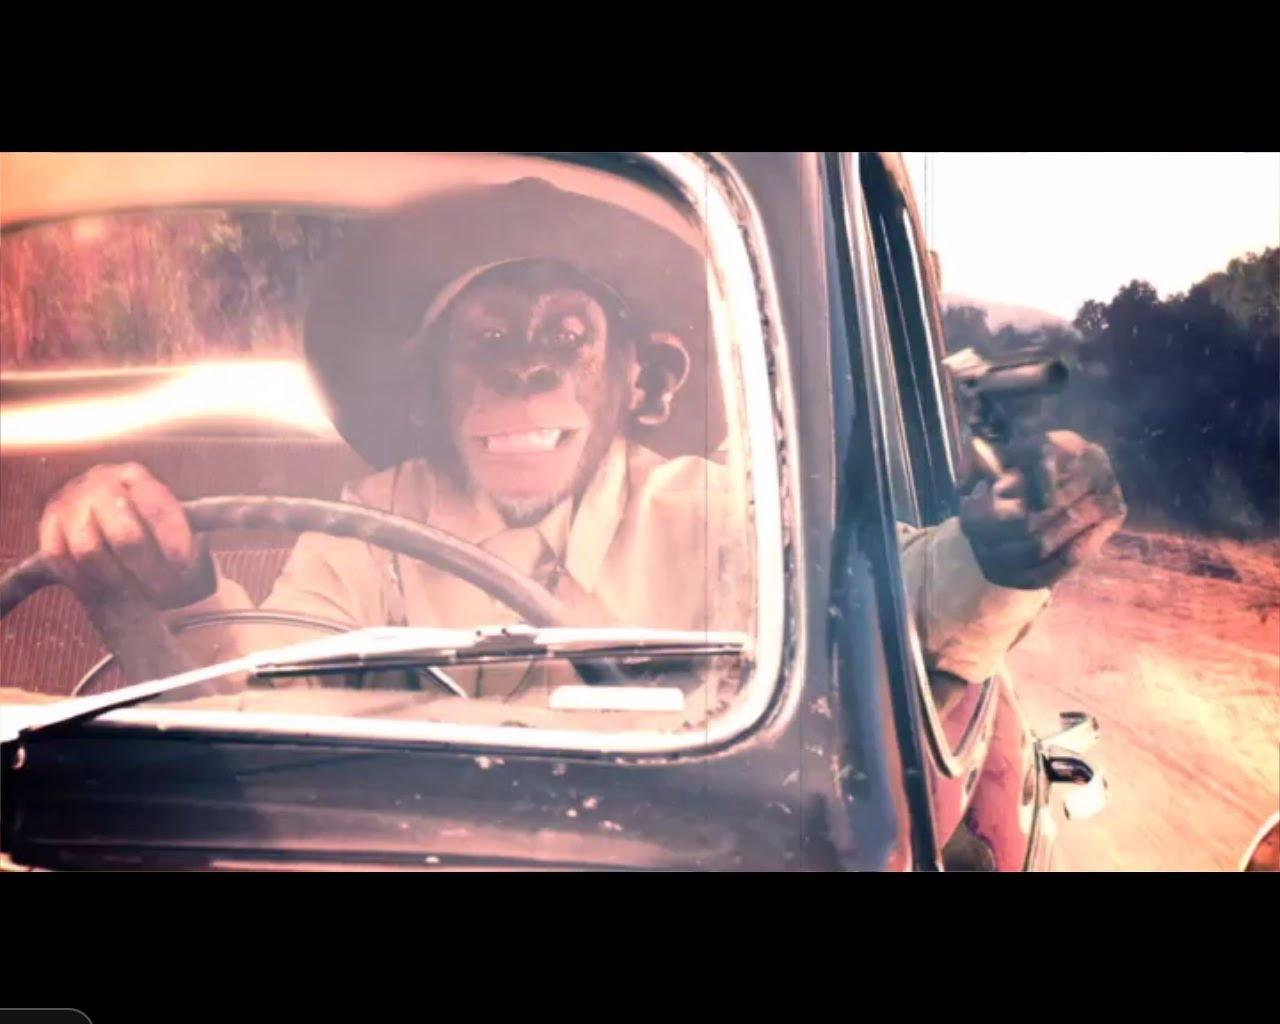 Megadeth - Public Enemy No. 1 OFFICIAL VIDEO